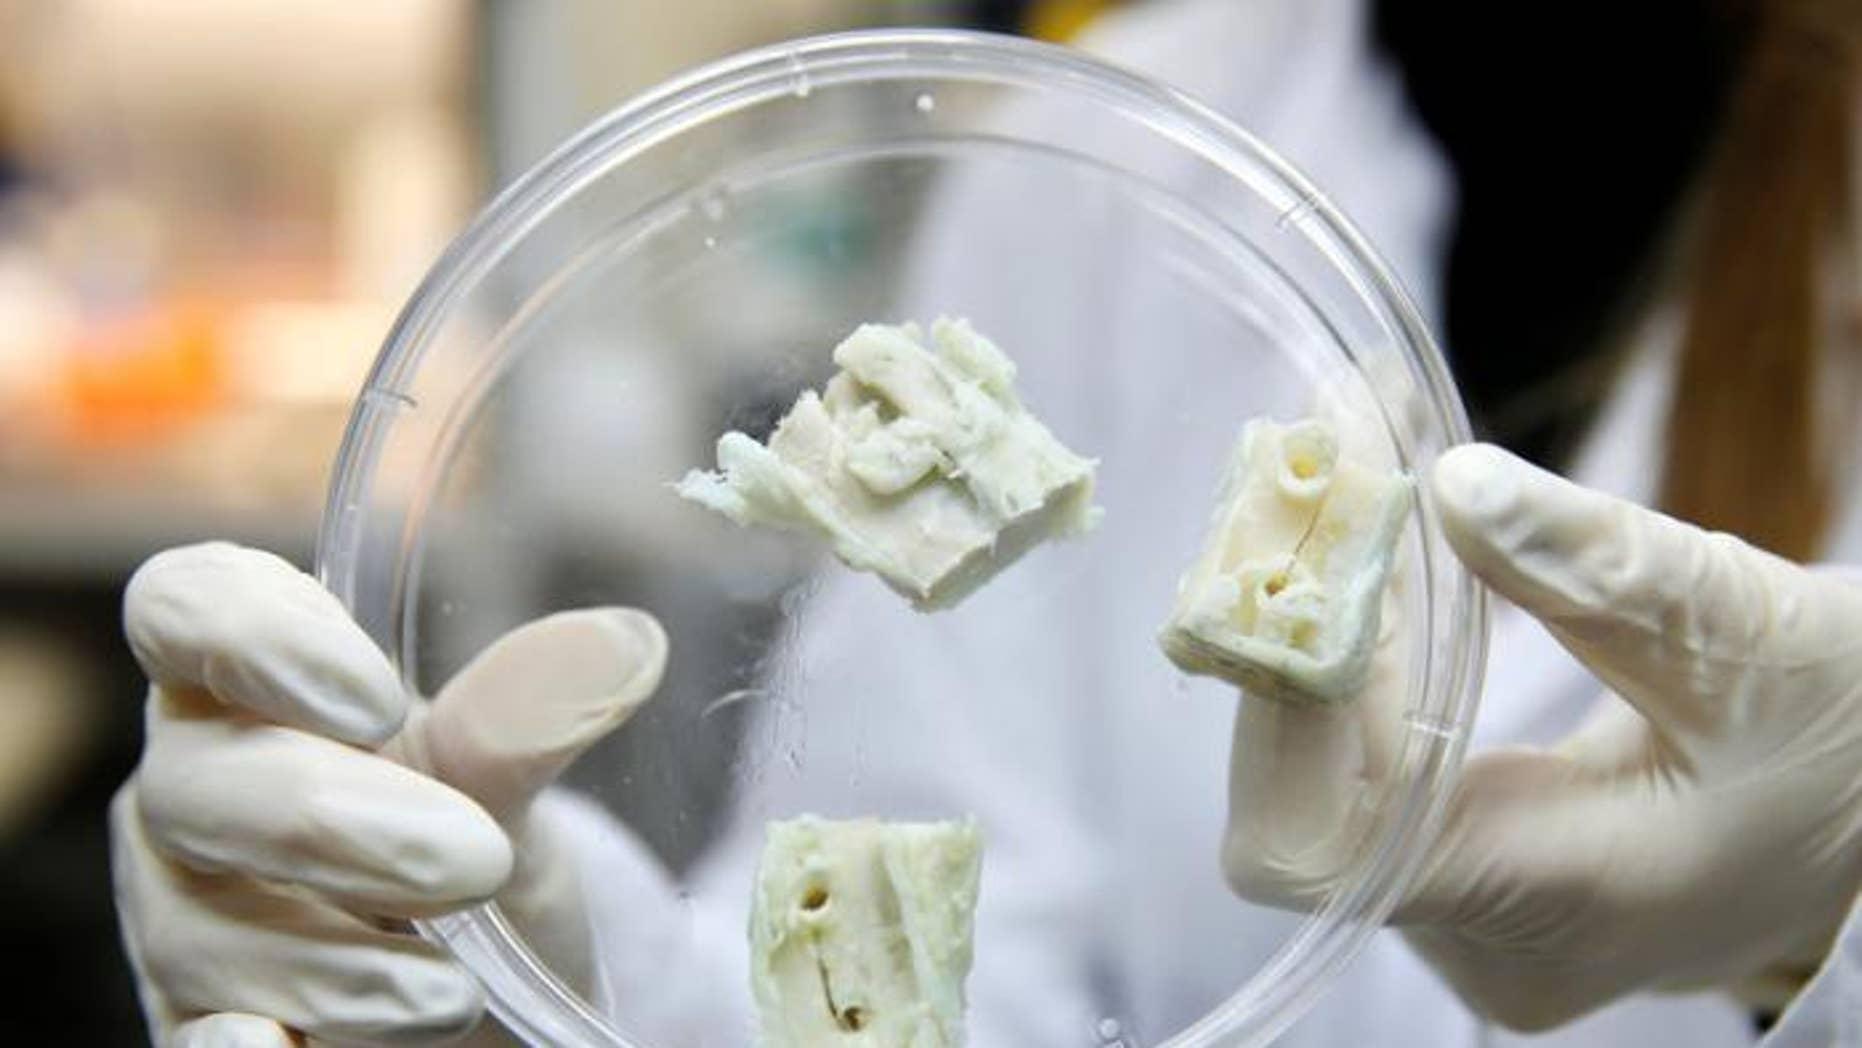 Dec. 4, 2016: A researcher displays parts of a lab-grown, semi-liquid bone graft at the laboratory of Israeli biotech firm Bonus Biogroup in Haifa, Israel.